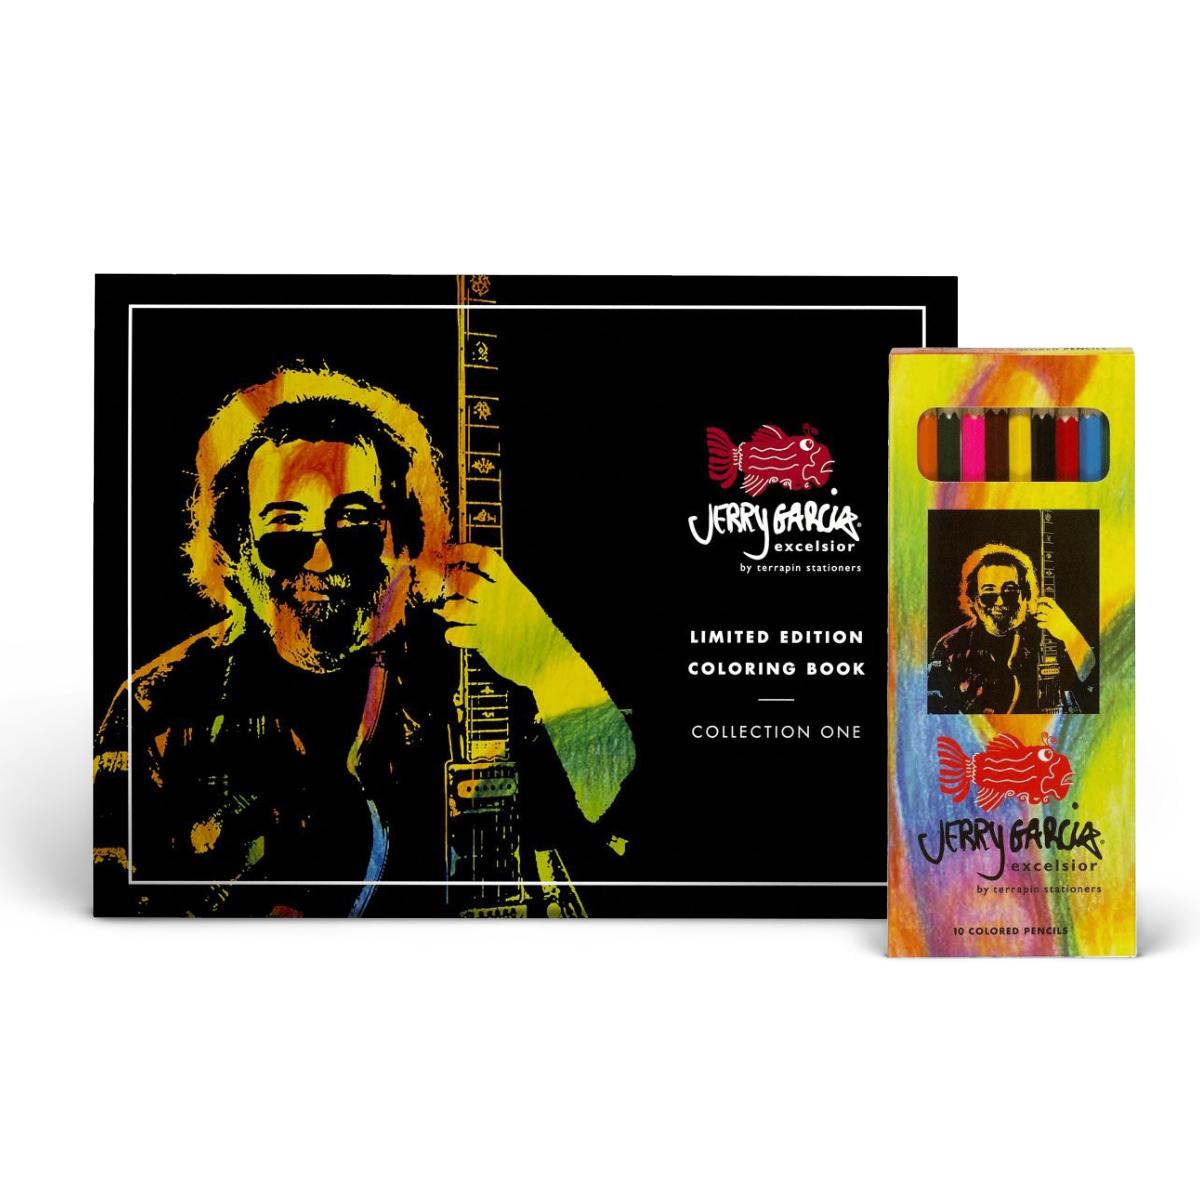 Jerry Garcia Excelsior® Coloring Book & Pencils